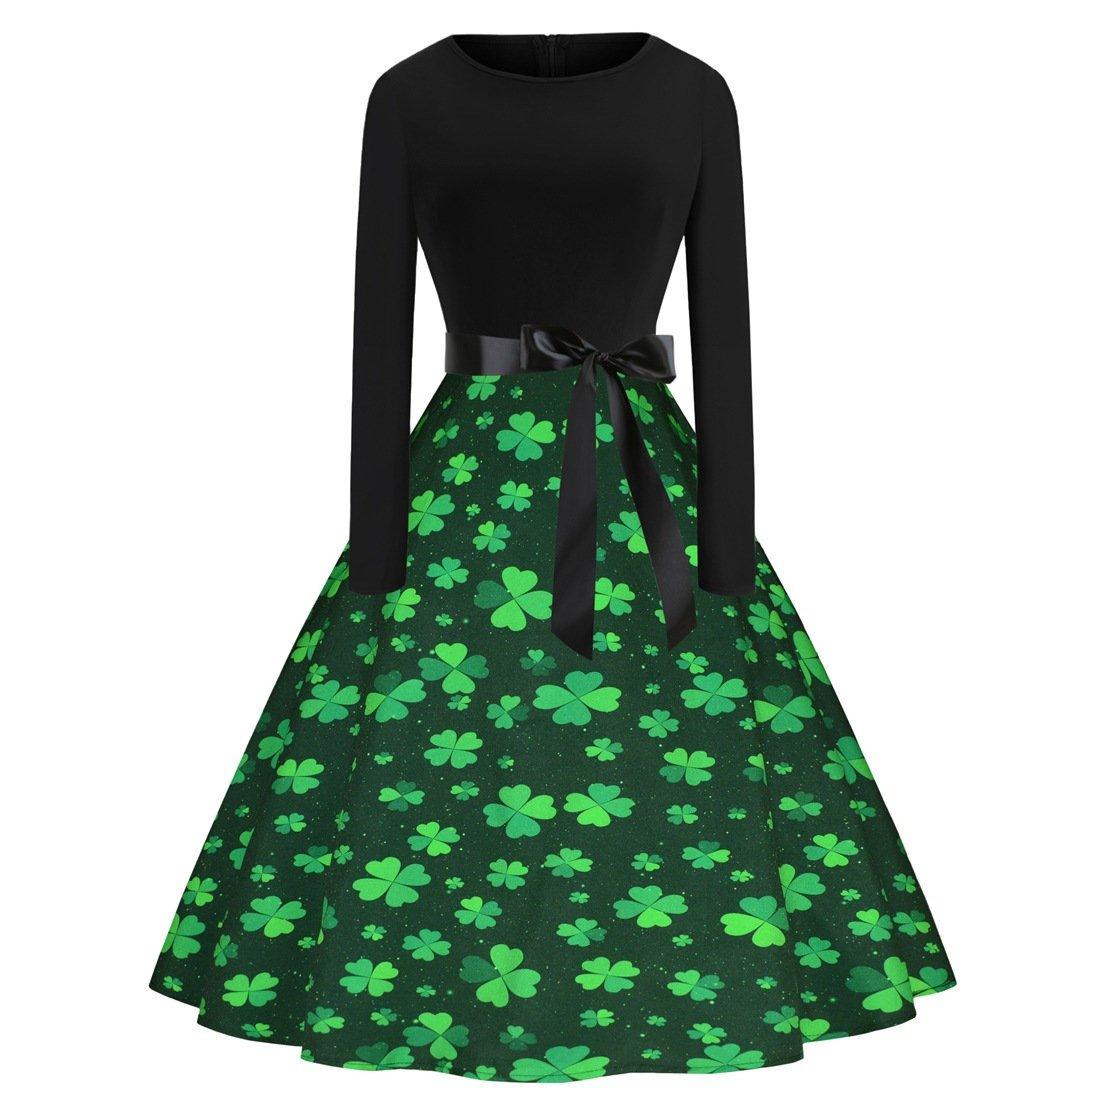 St. Patrick's Day Casual Vintage Dress Shamrocks Fashion Clothing Retro Midi Party Dresses